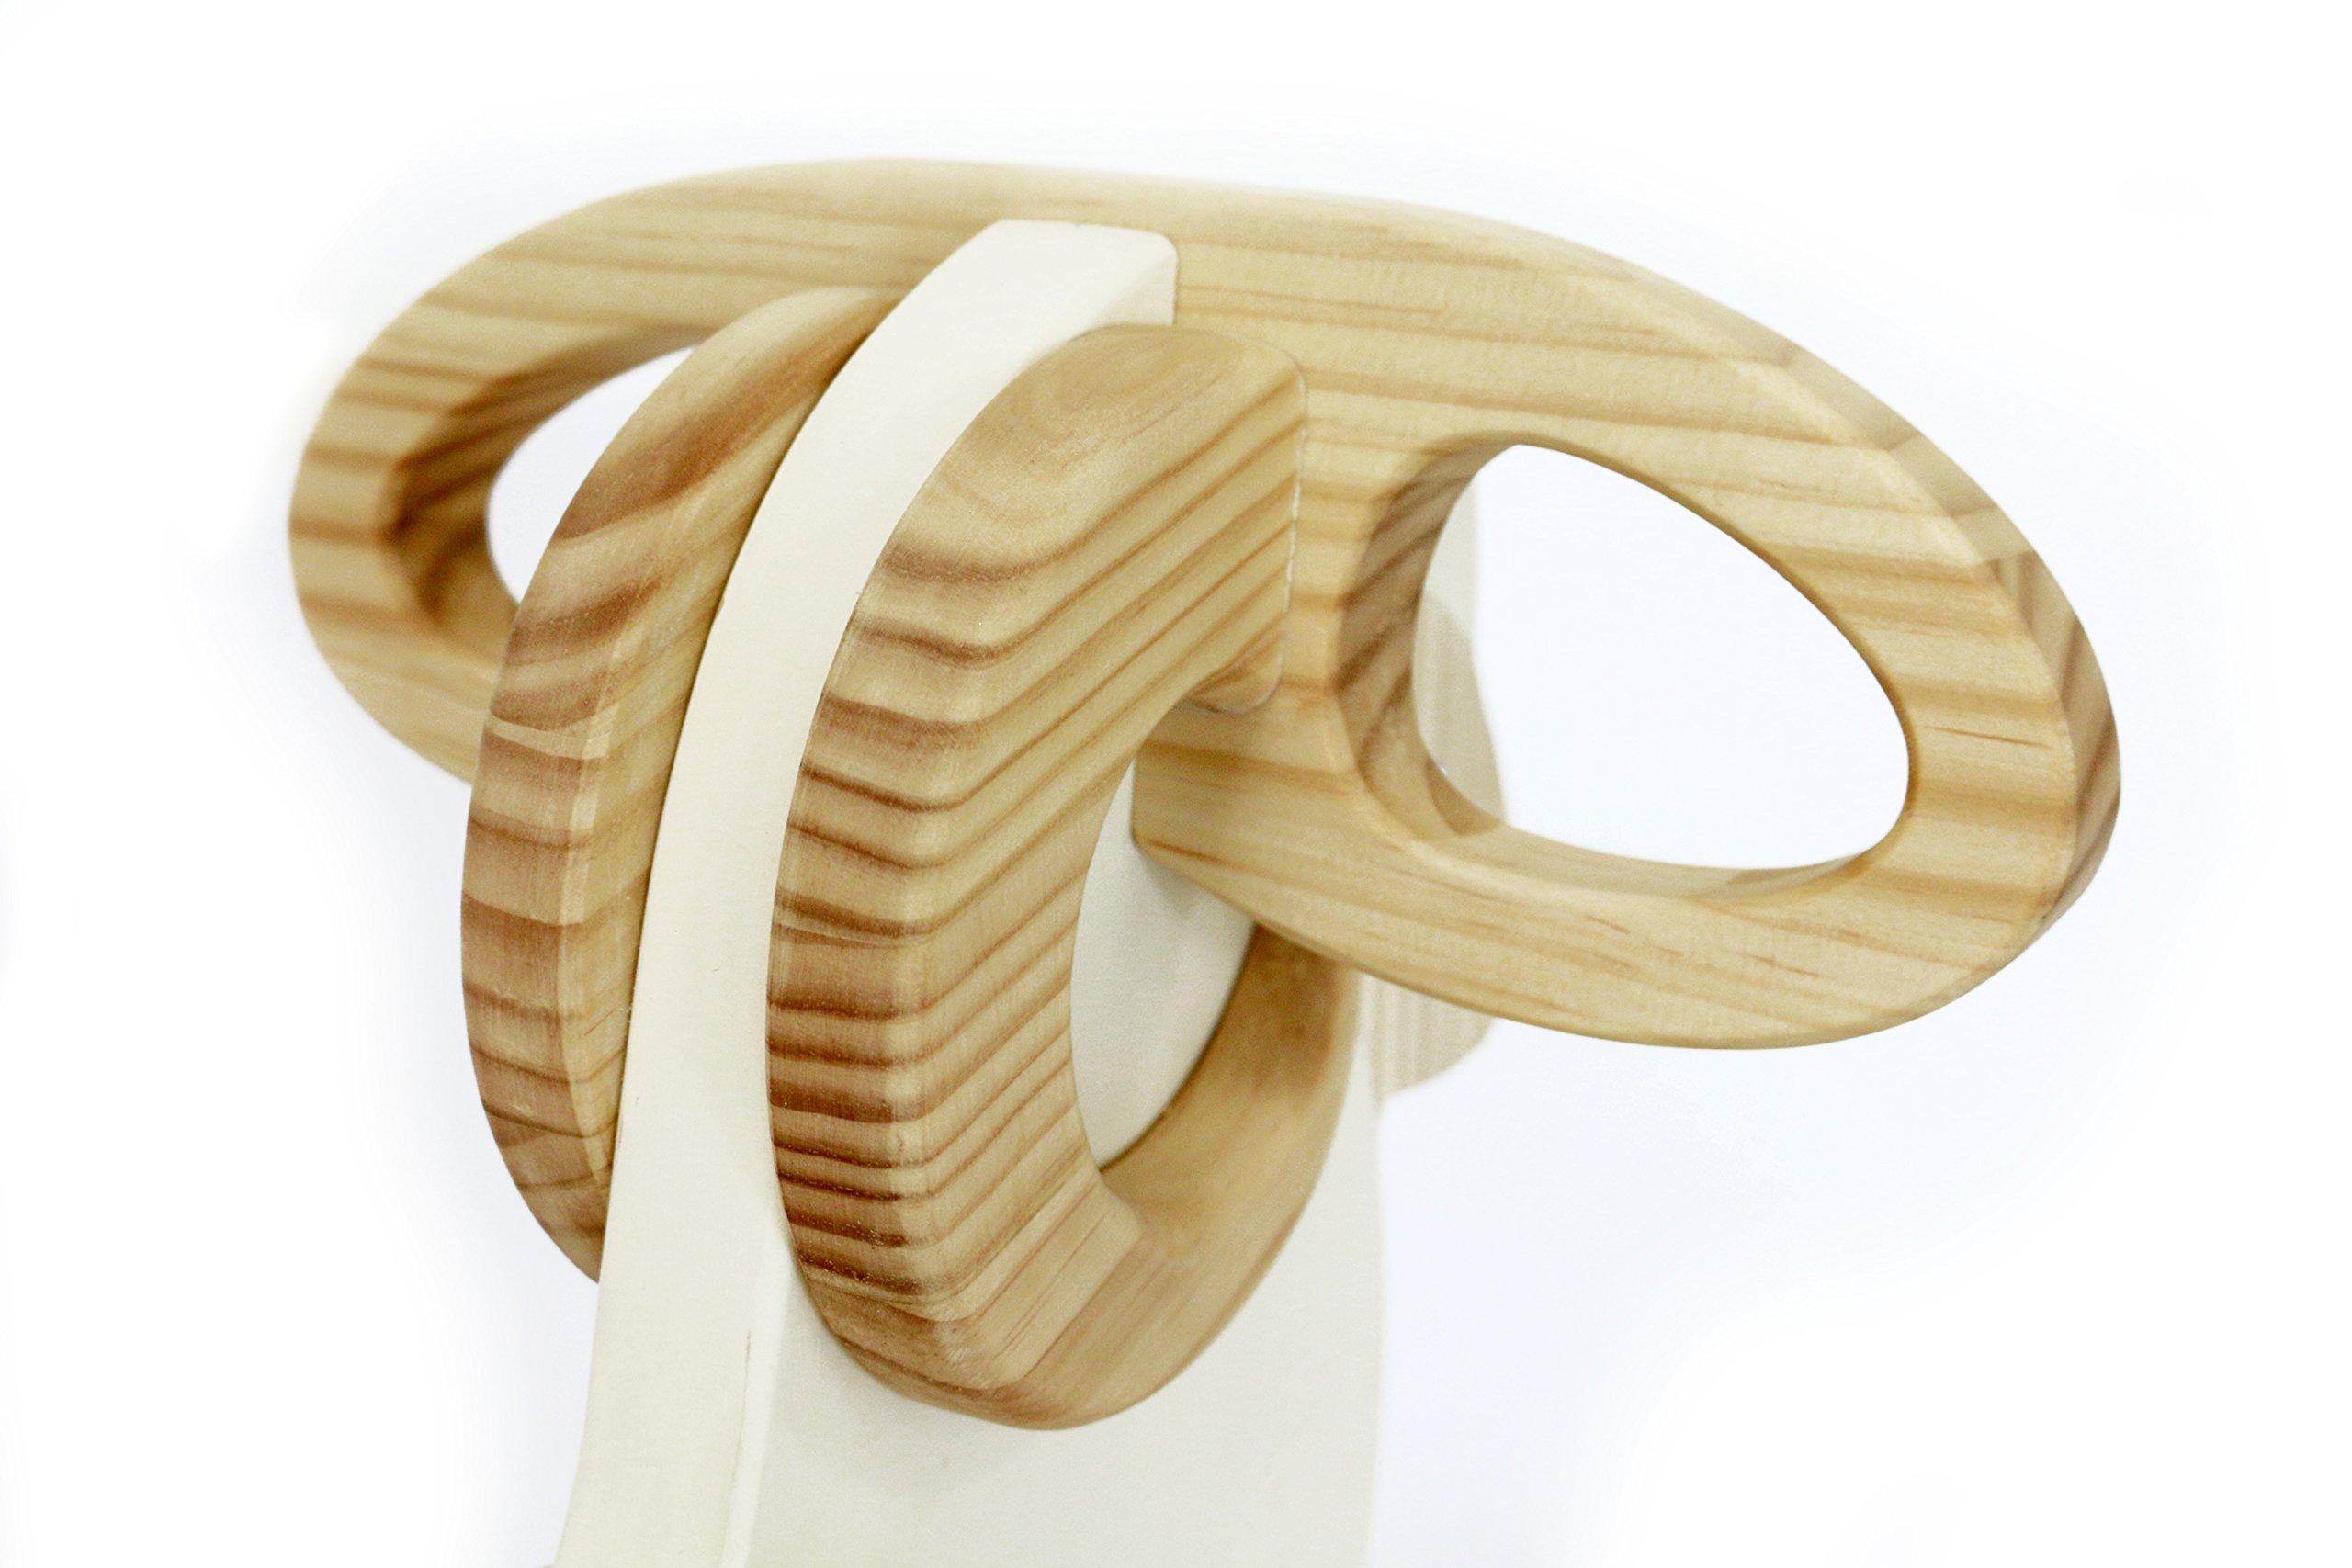 WOODSTUDIOALP Wooden Rocking Cream Sheep 100% Handmade